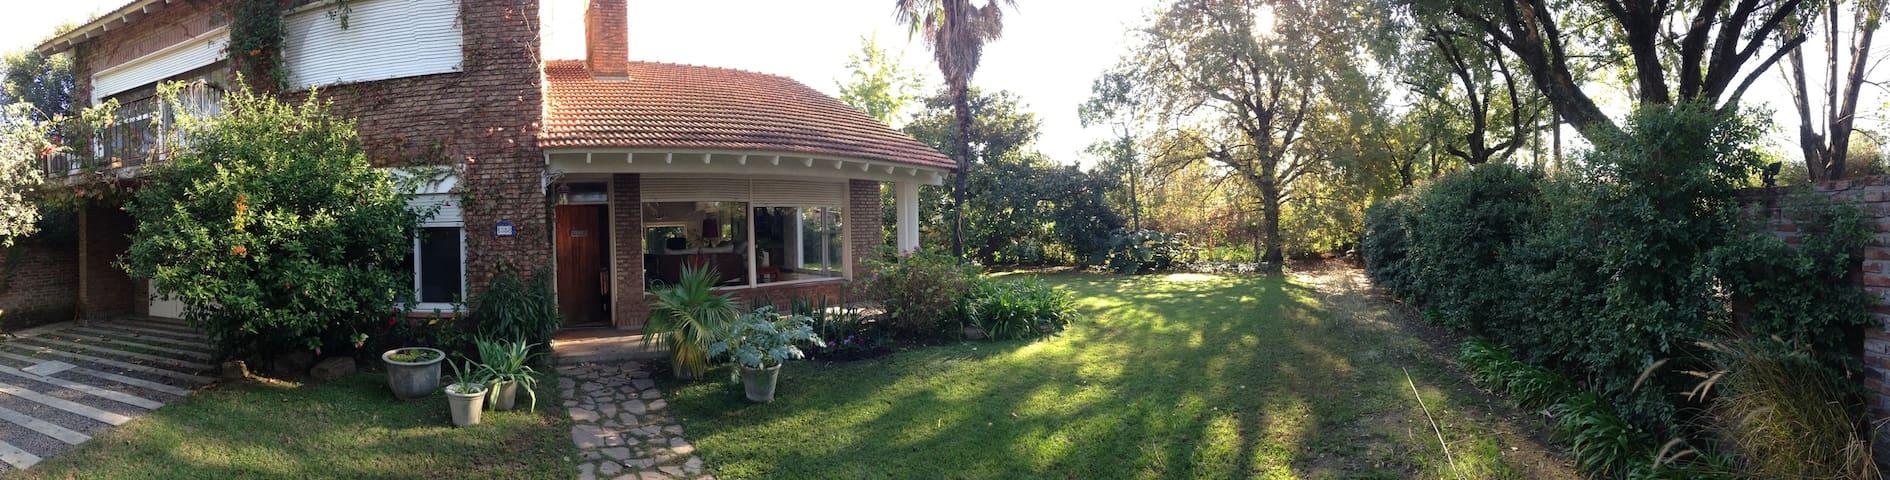 Casa muy luminosa con jardín - Beccar - Hus